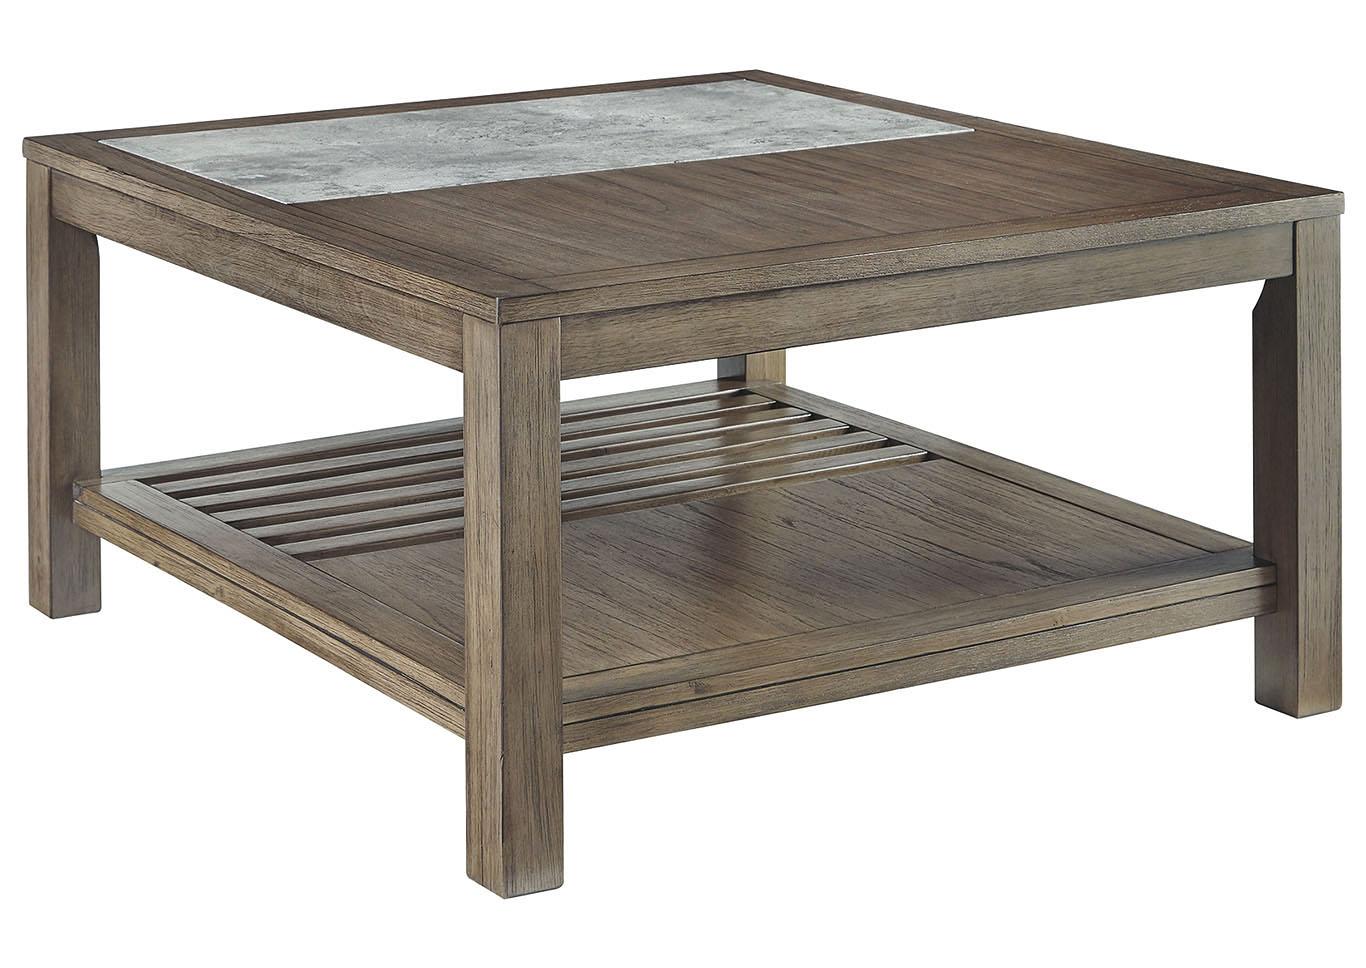 Brilliant Furniture Mart Usa Discount Ashley Furniture Store Cjindustries Chair Design For Home Cjindustriesco